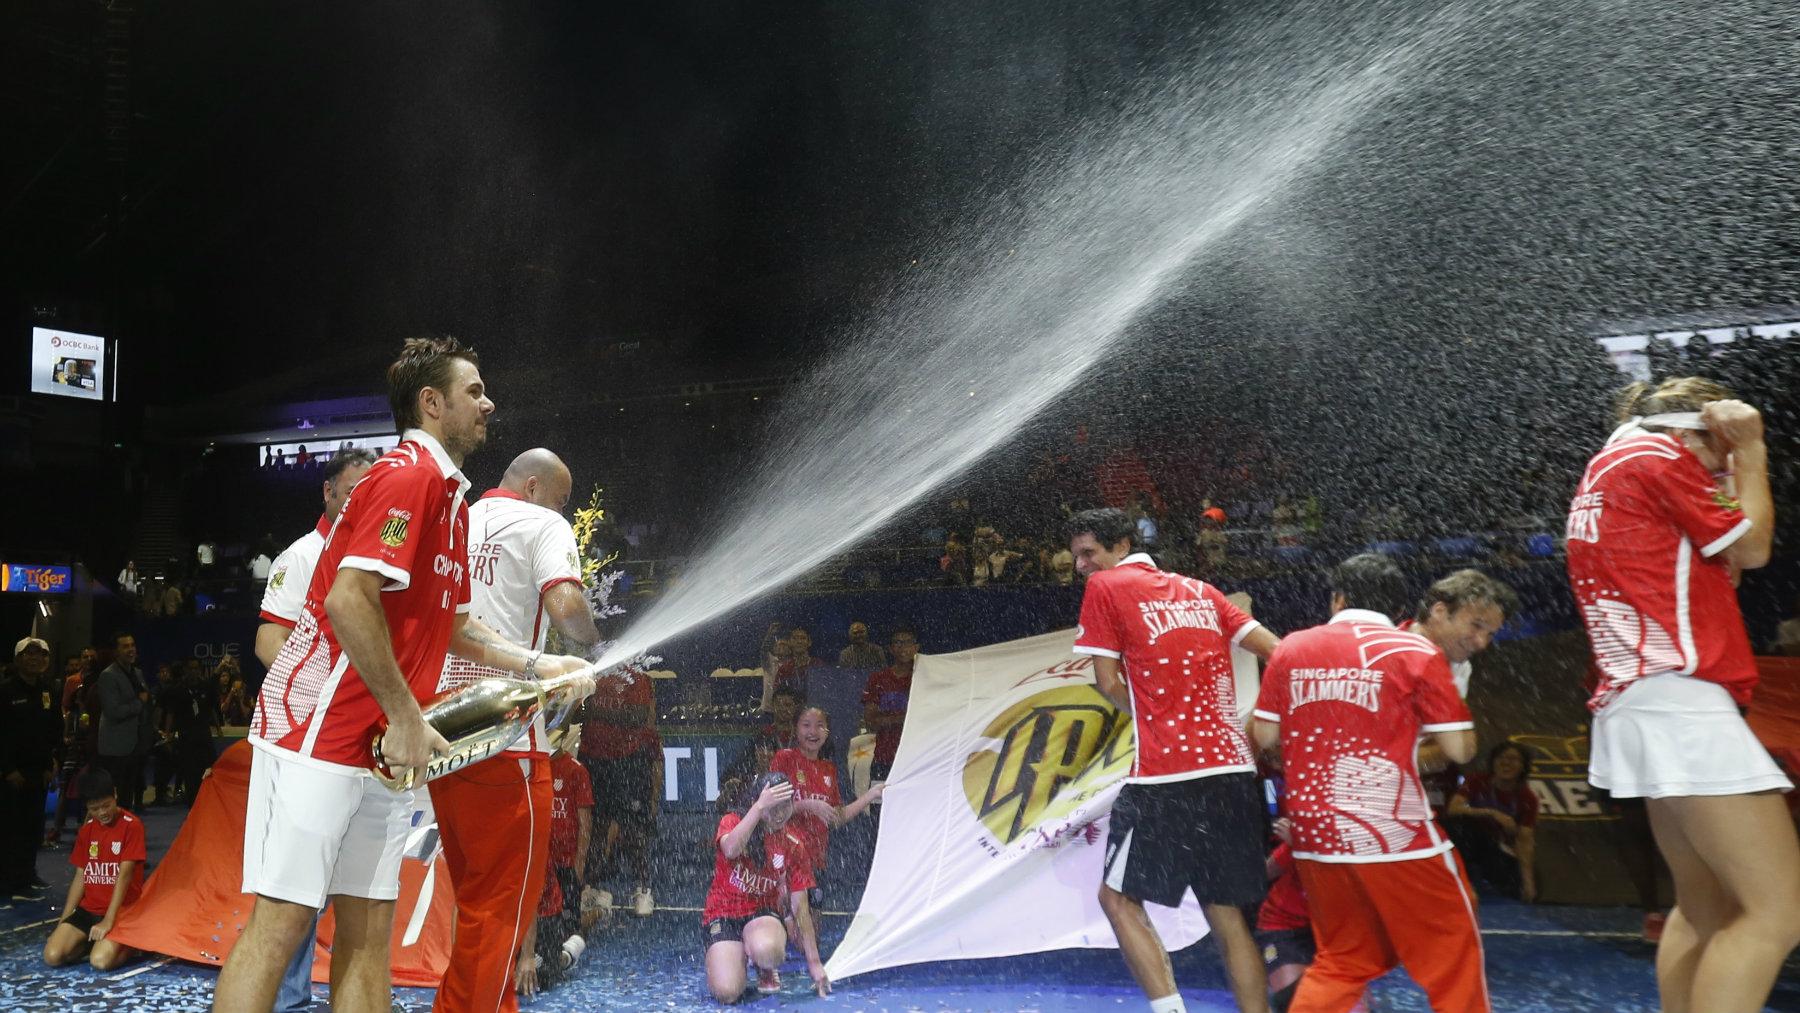 International Premier Tennis League Final Stan Wawrinka sprays champagne with members of the Singapore Slammers after winning the final.